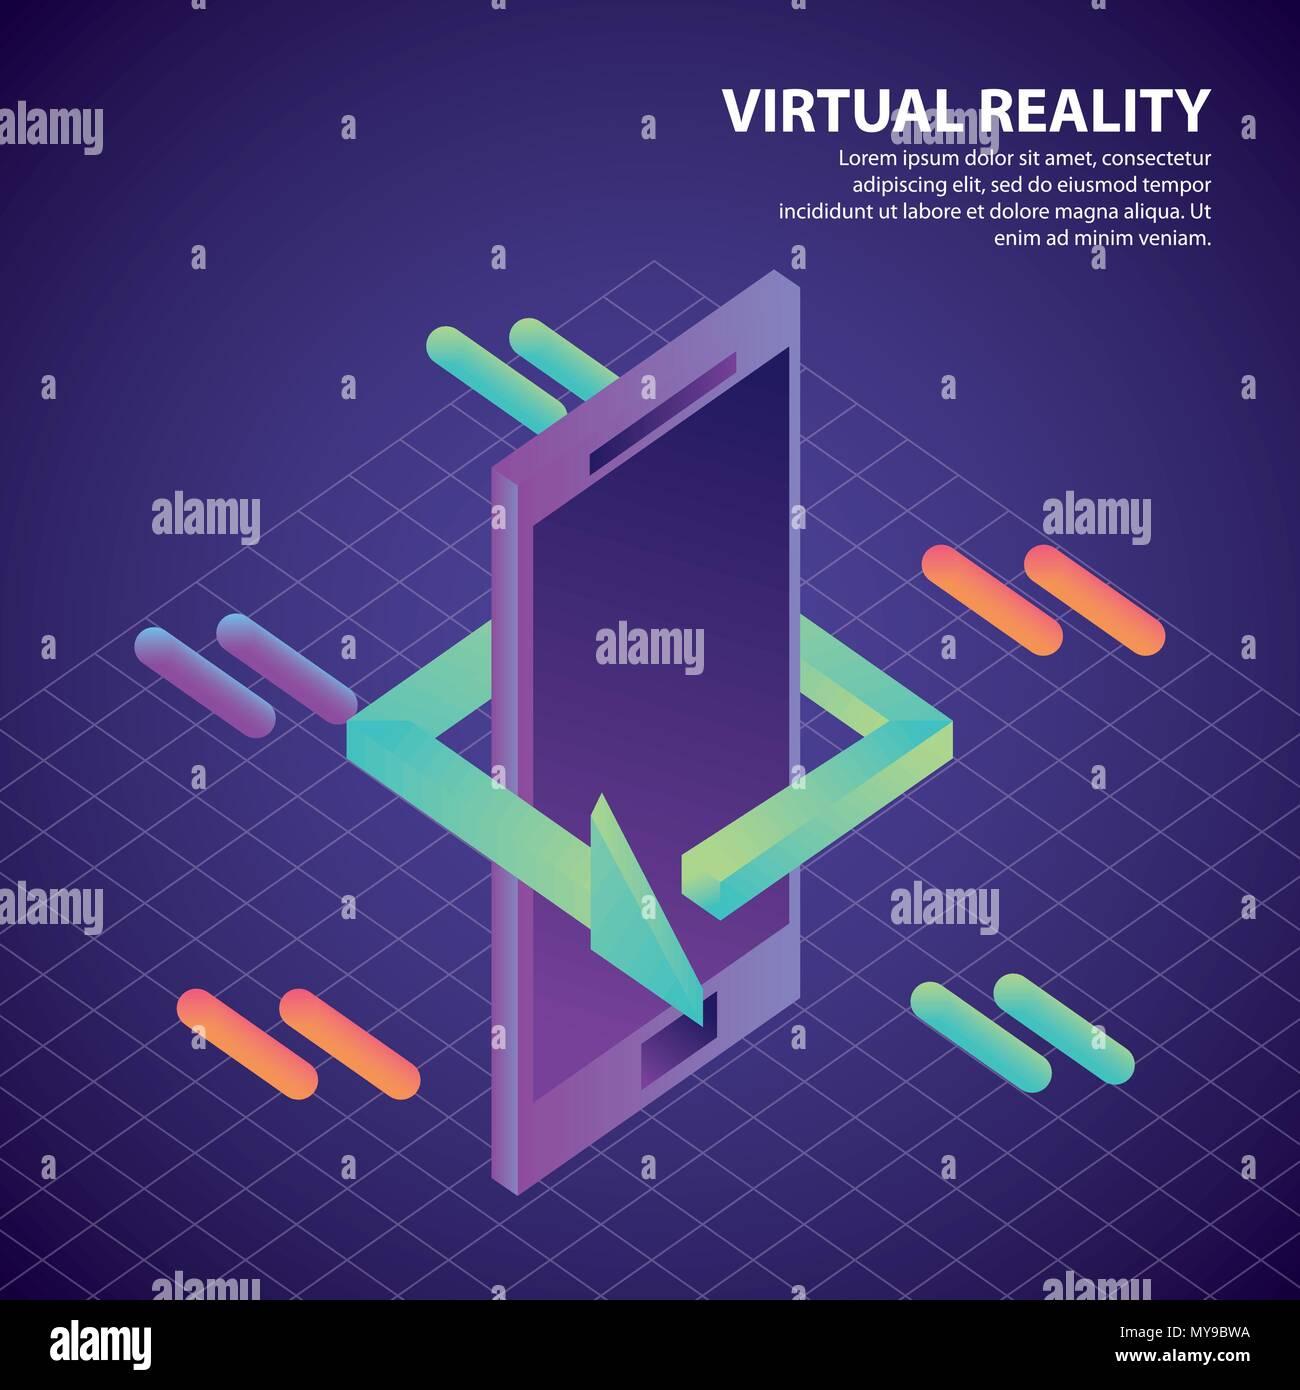 virtual reality isometric - Stock Image